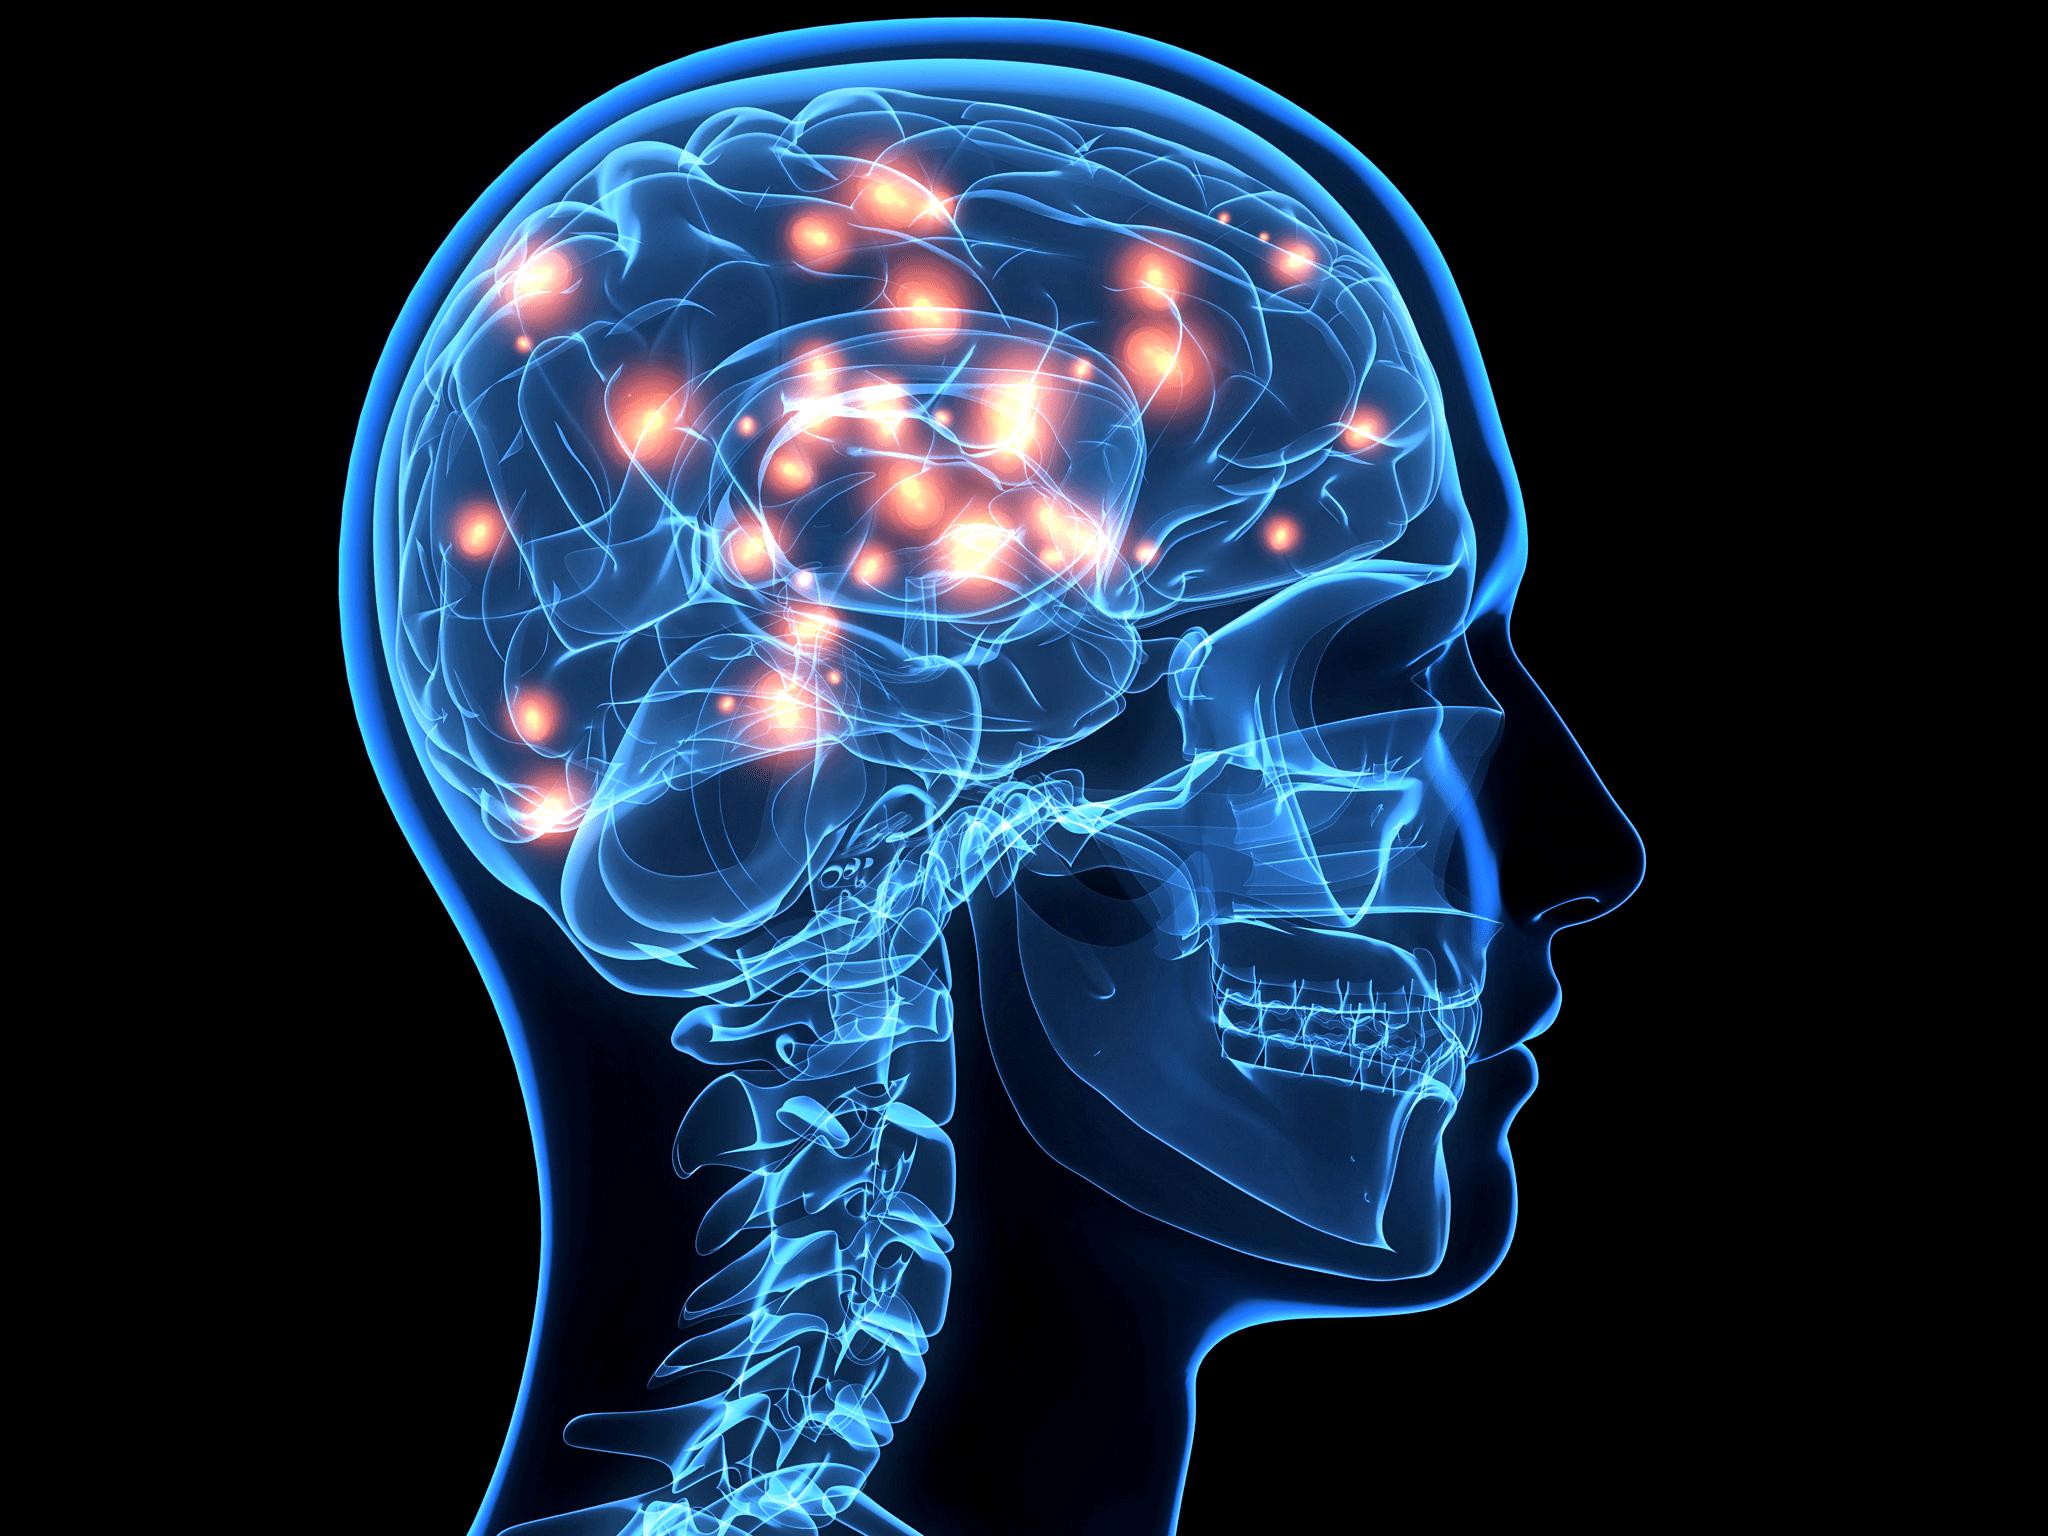 Medical,Head,Organ,Brain,Medical imaging,Joint,Organism,X.